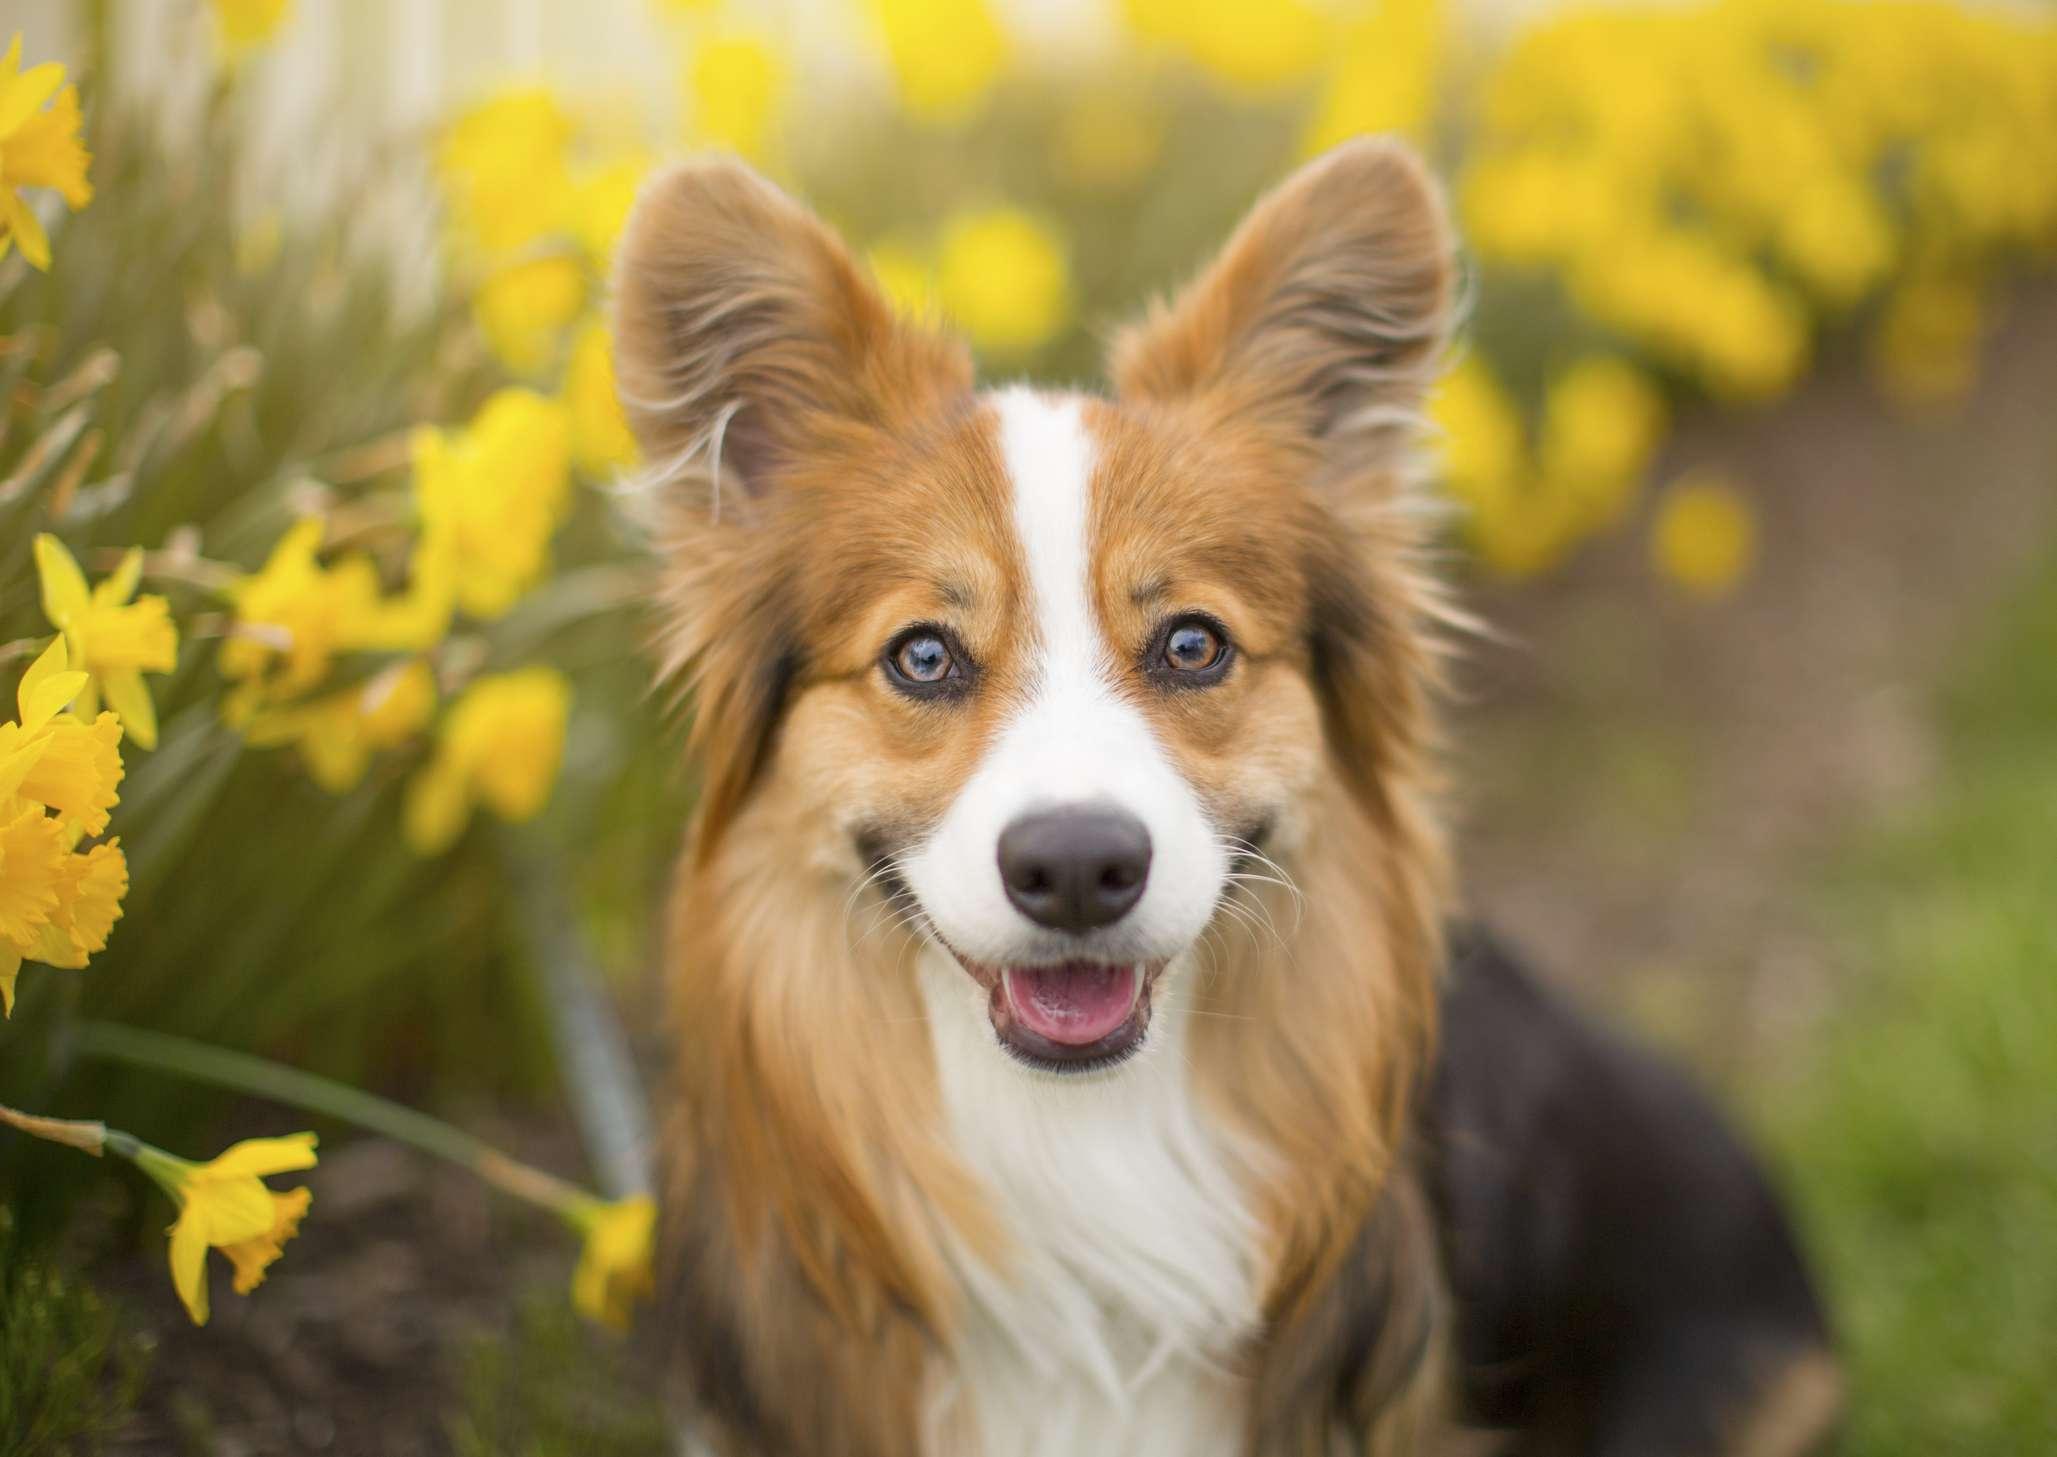 Corgi dog with daffodils in background